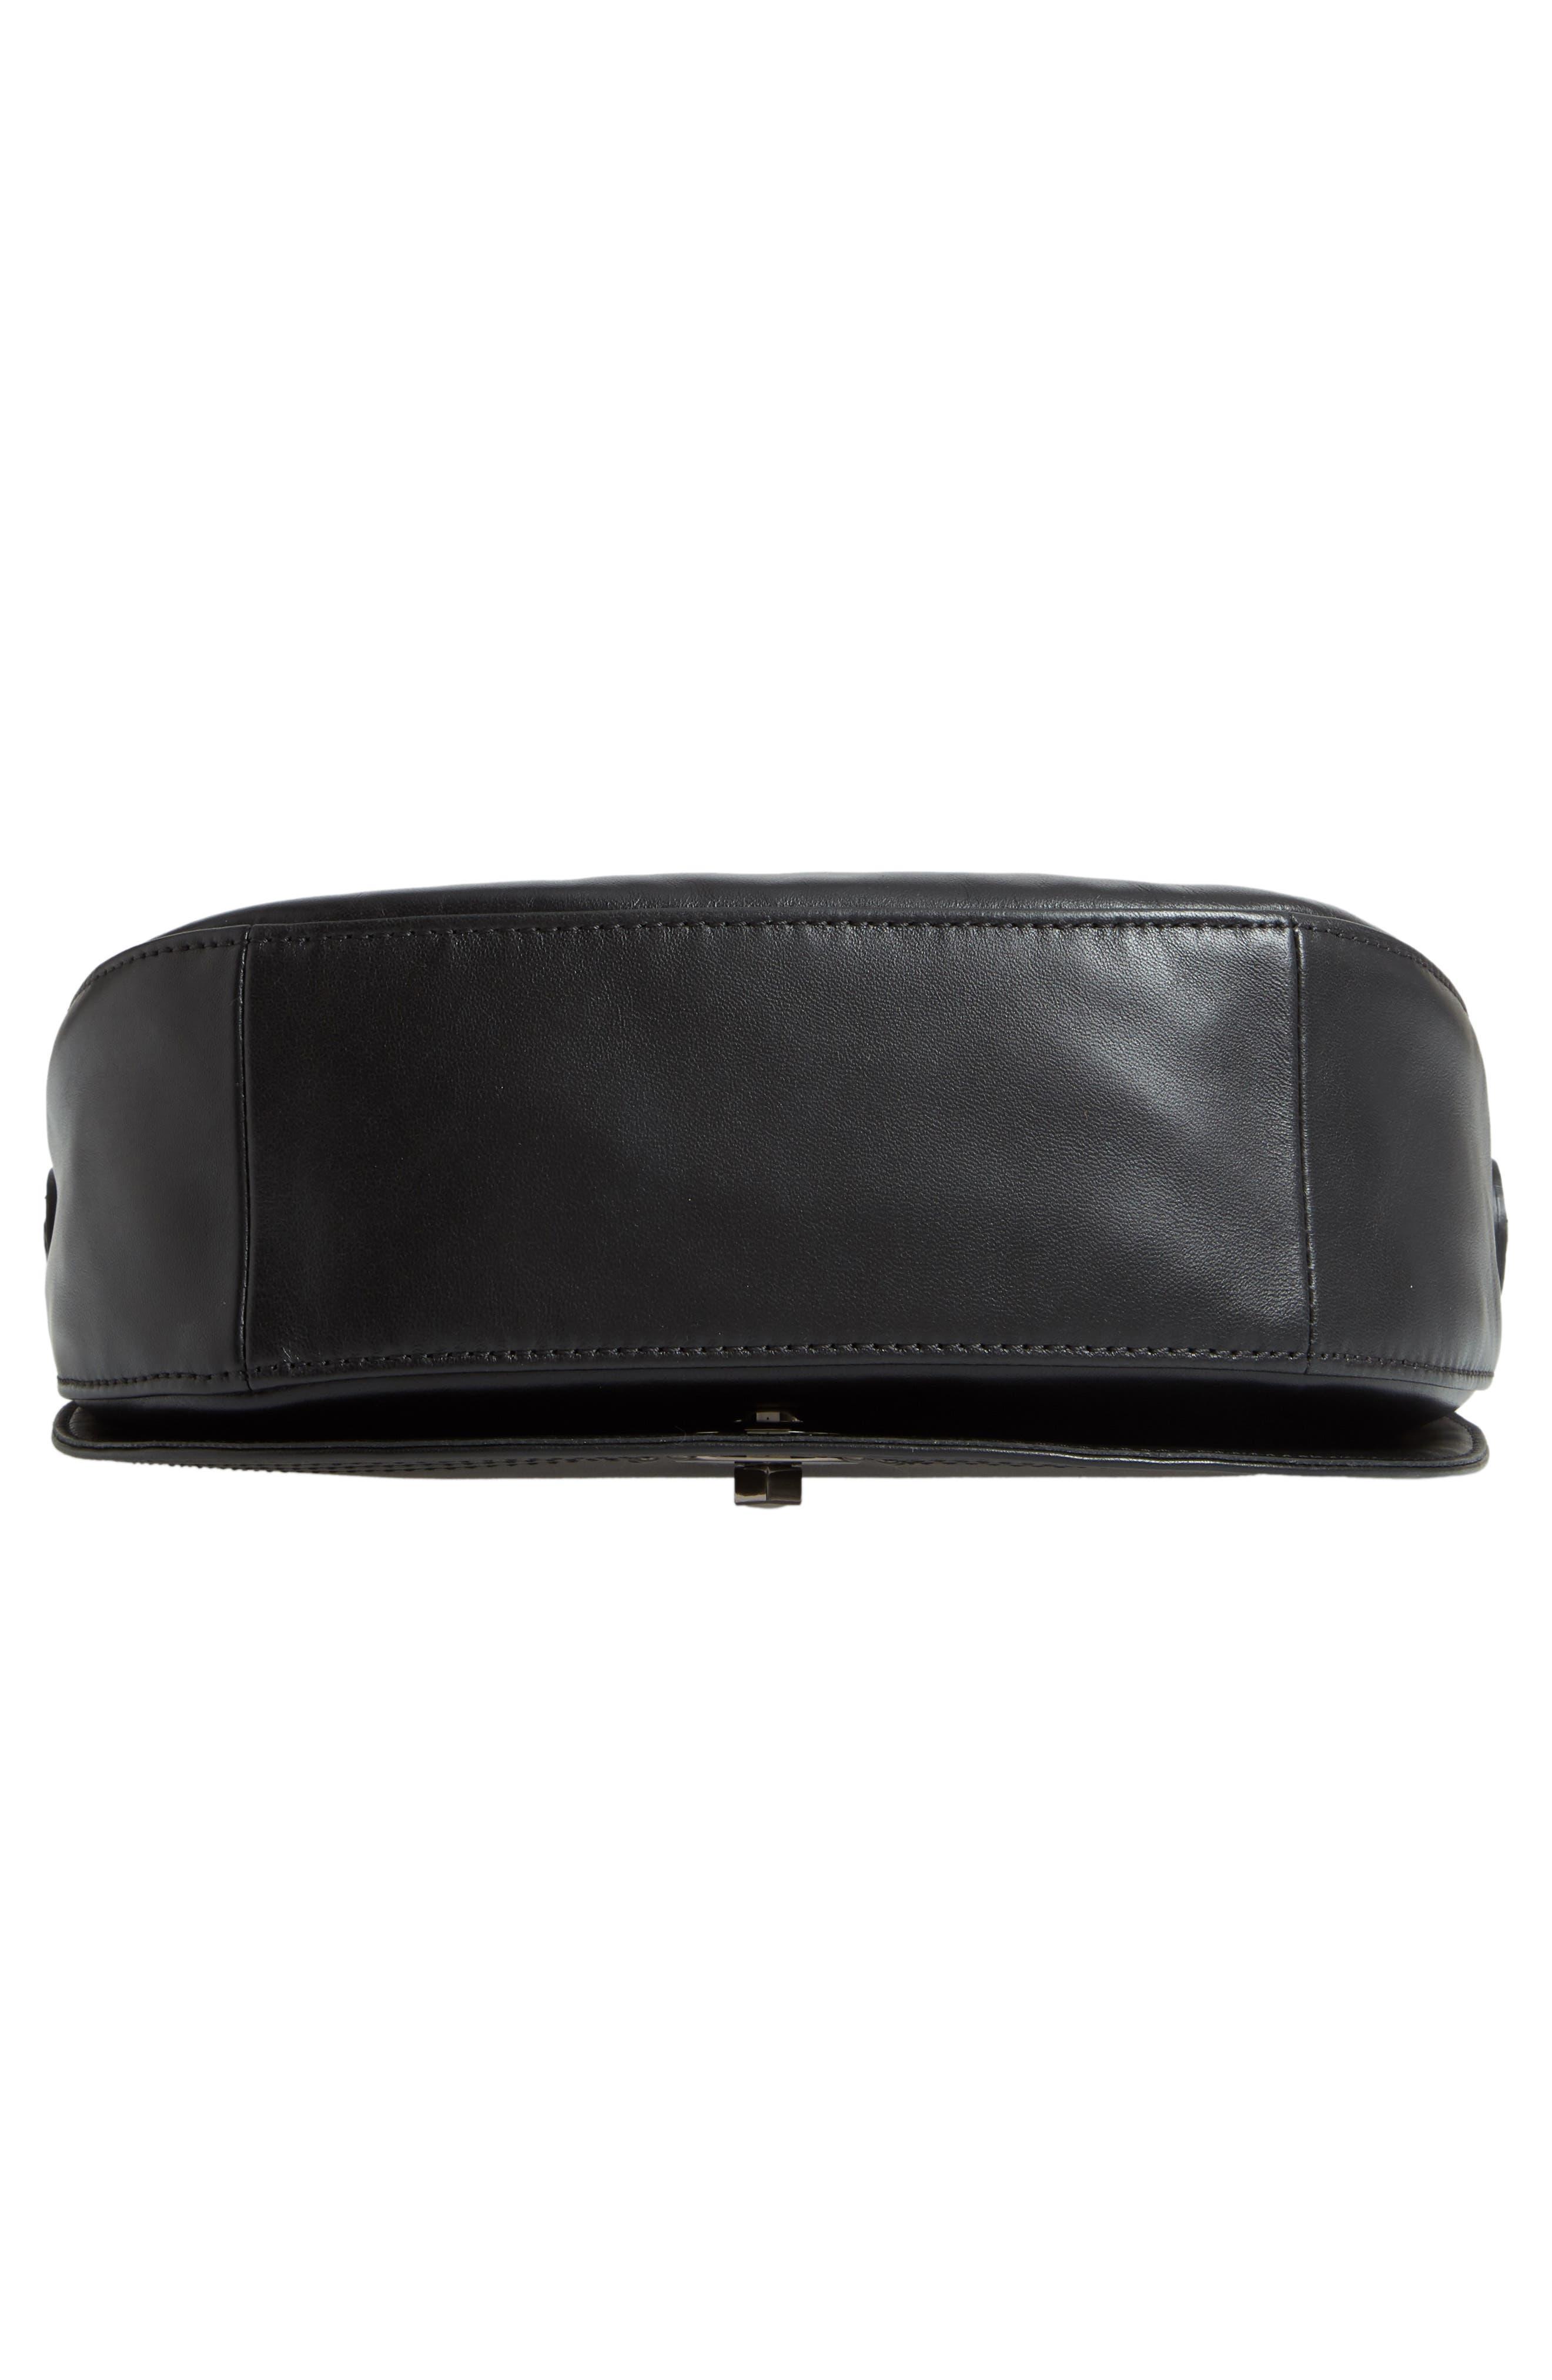 Medium Cavalcade Leather Saddle Bag,                             Alternate thumbnail 6, color,                             BLACK